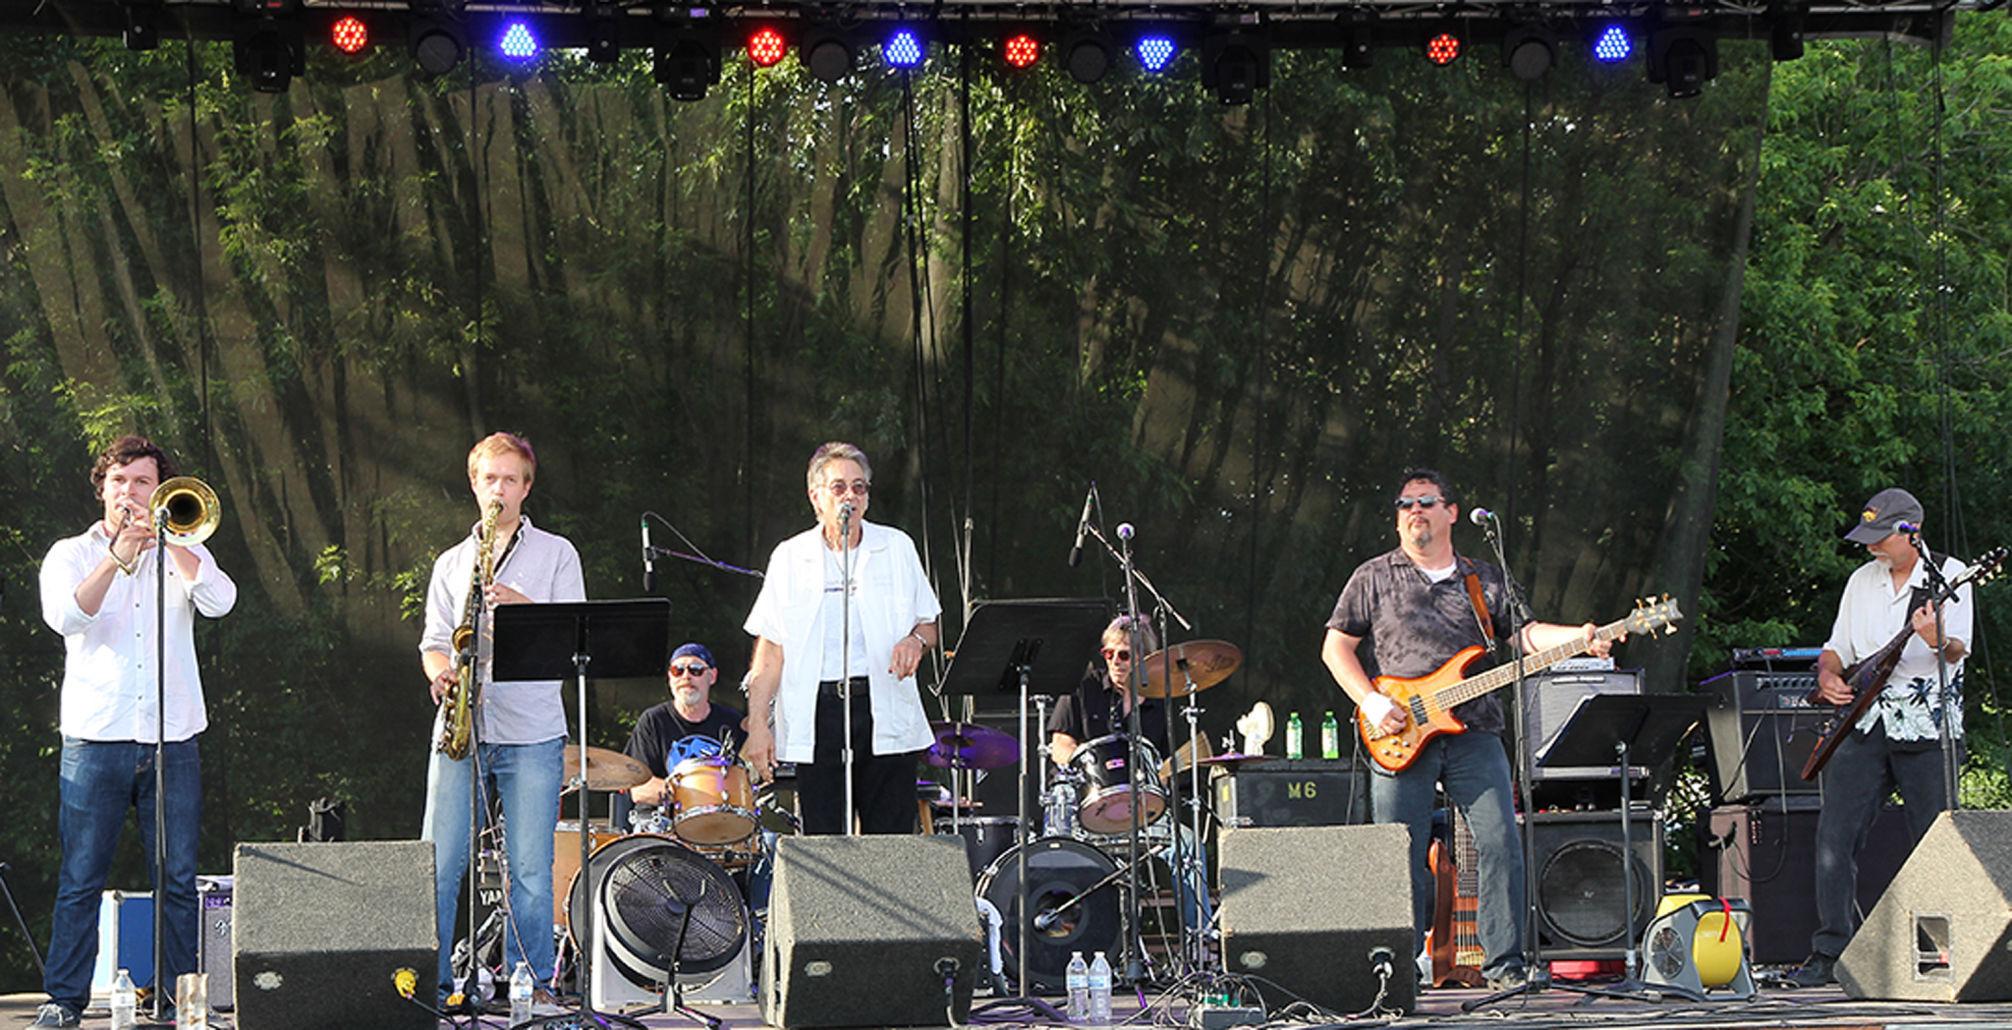 bob-door-and-blue-band & See ya later alligator! Bob Dorr \u0026 Blue Band calling it quits ... Pezcame.Com